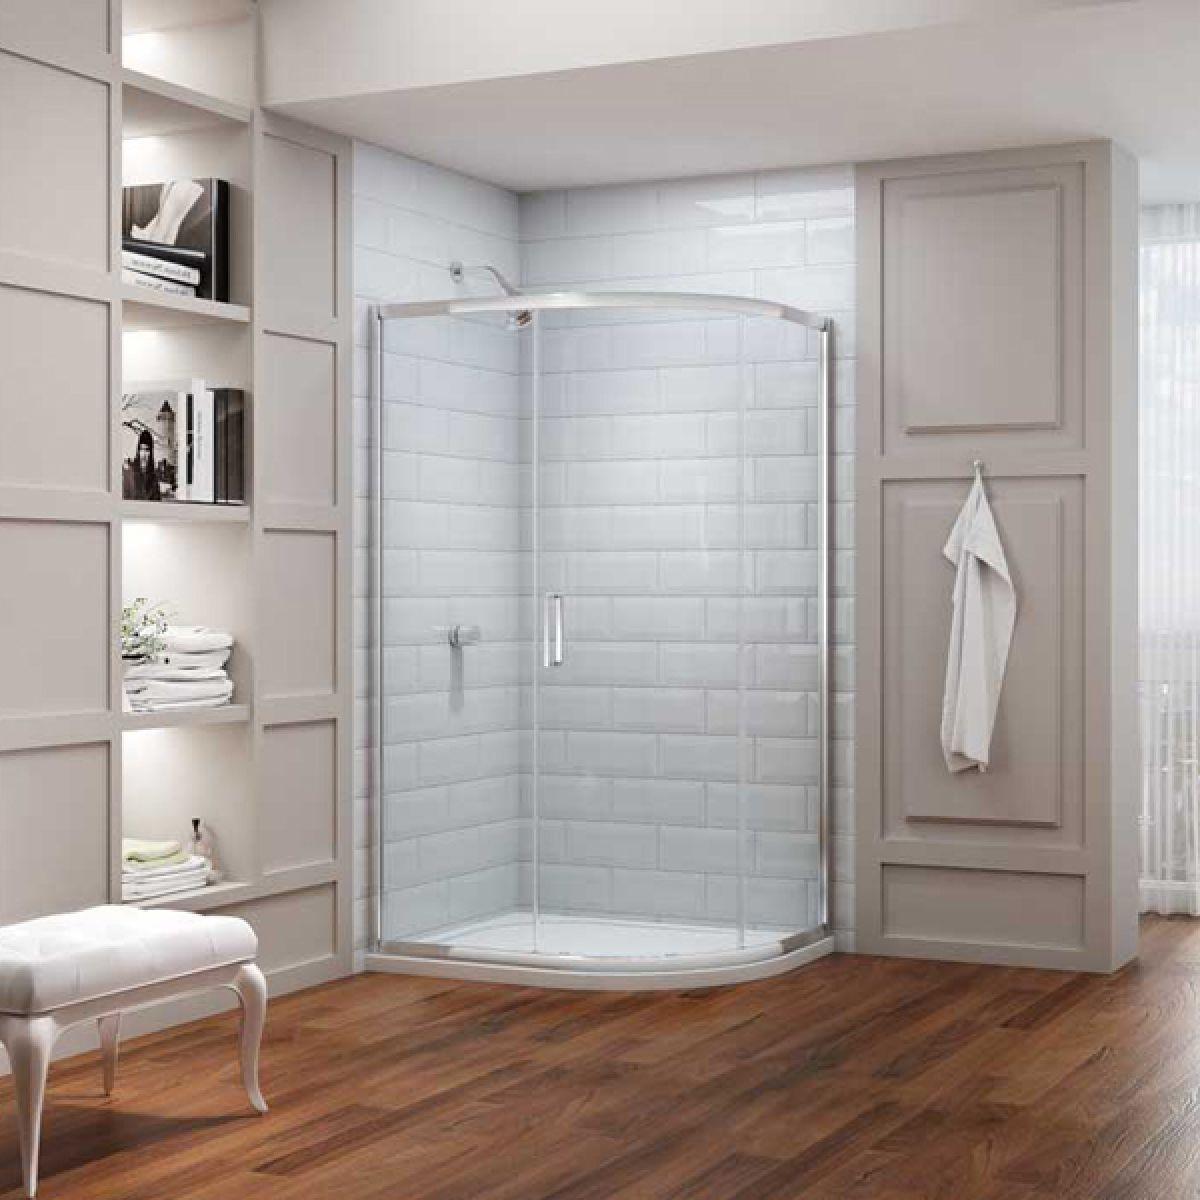 Merlyn Series 8 Offset Quadrant Shower Enclosure